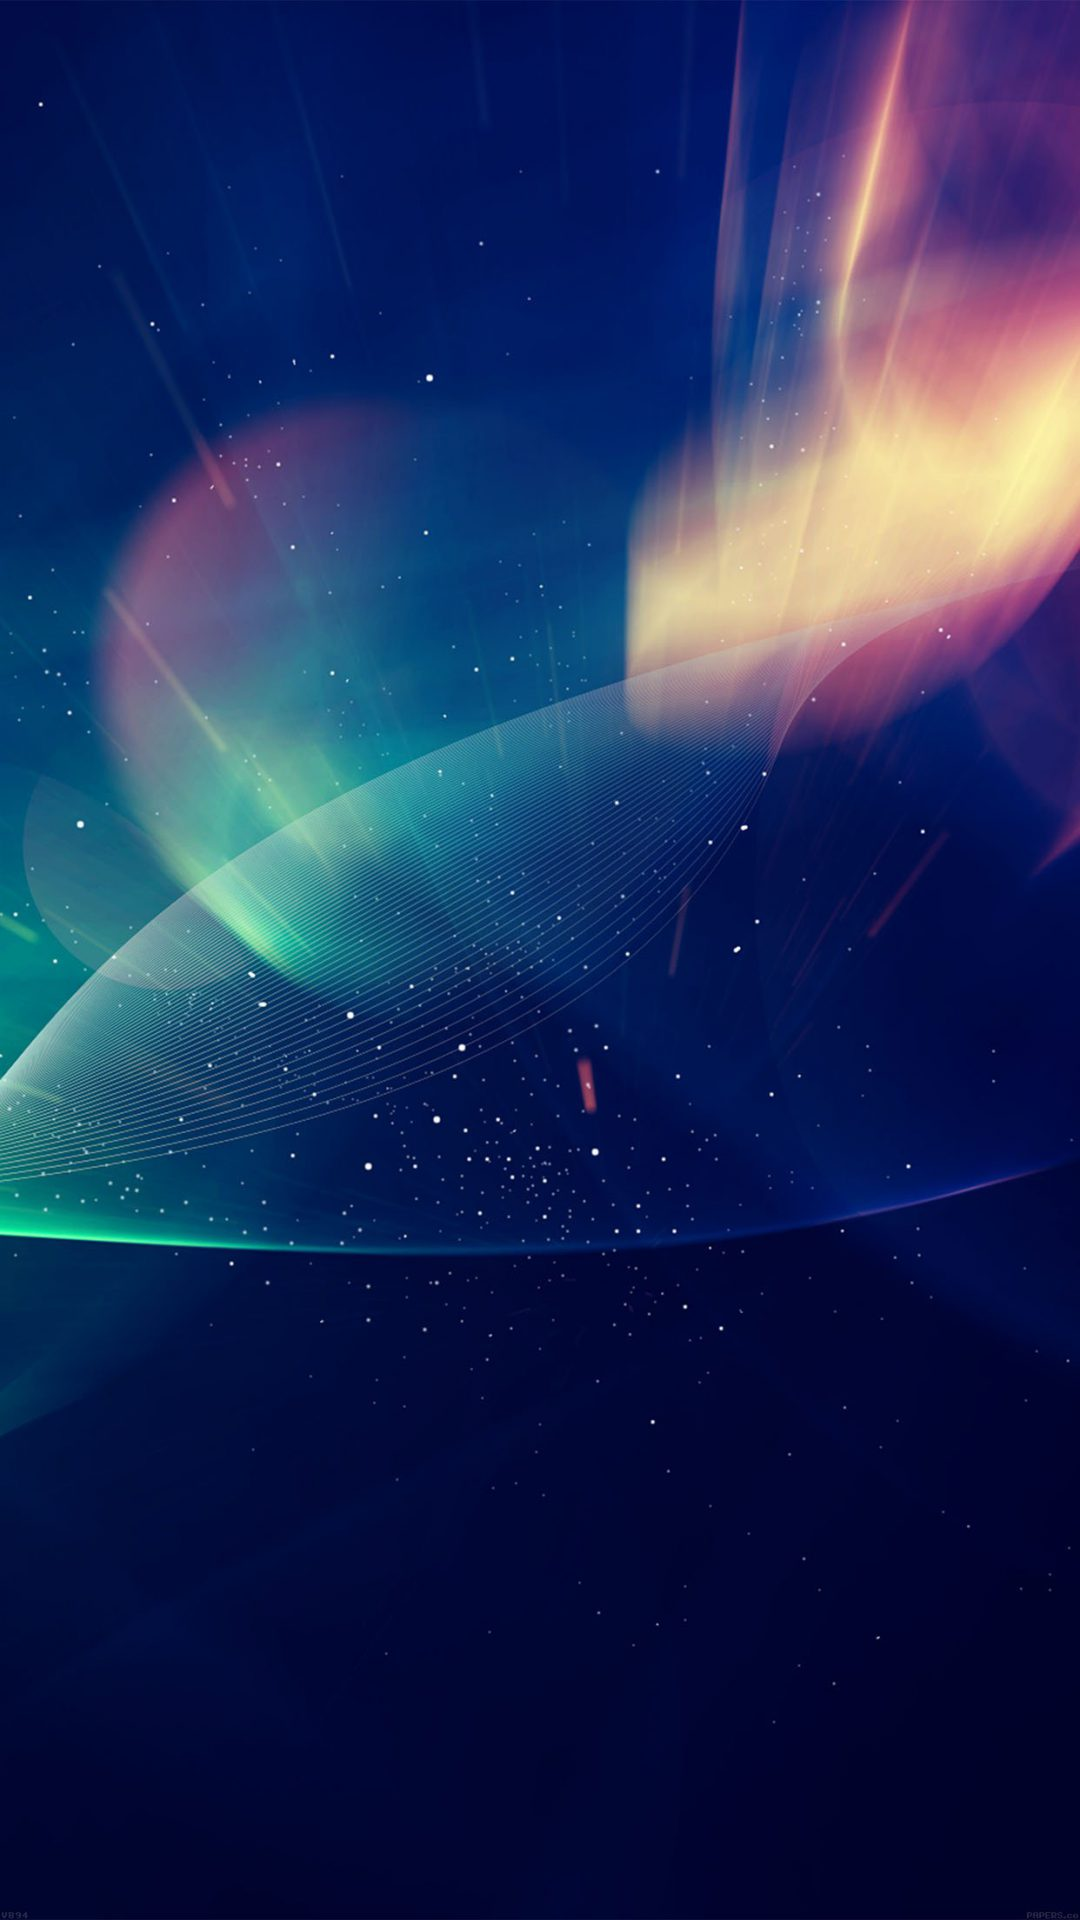 Abstract Lights Vector Illust Blue